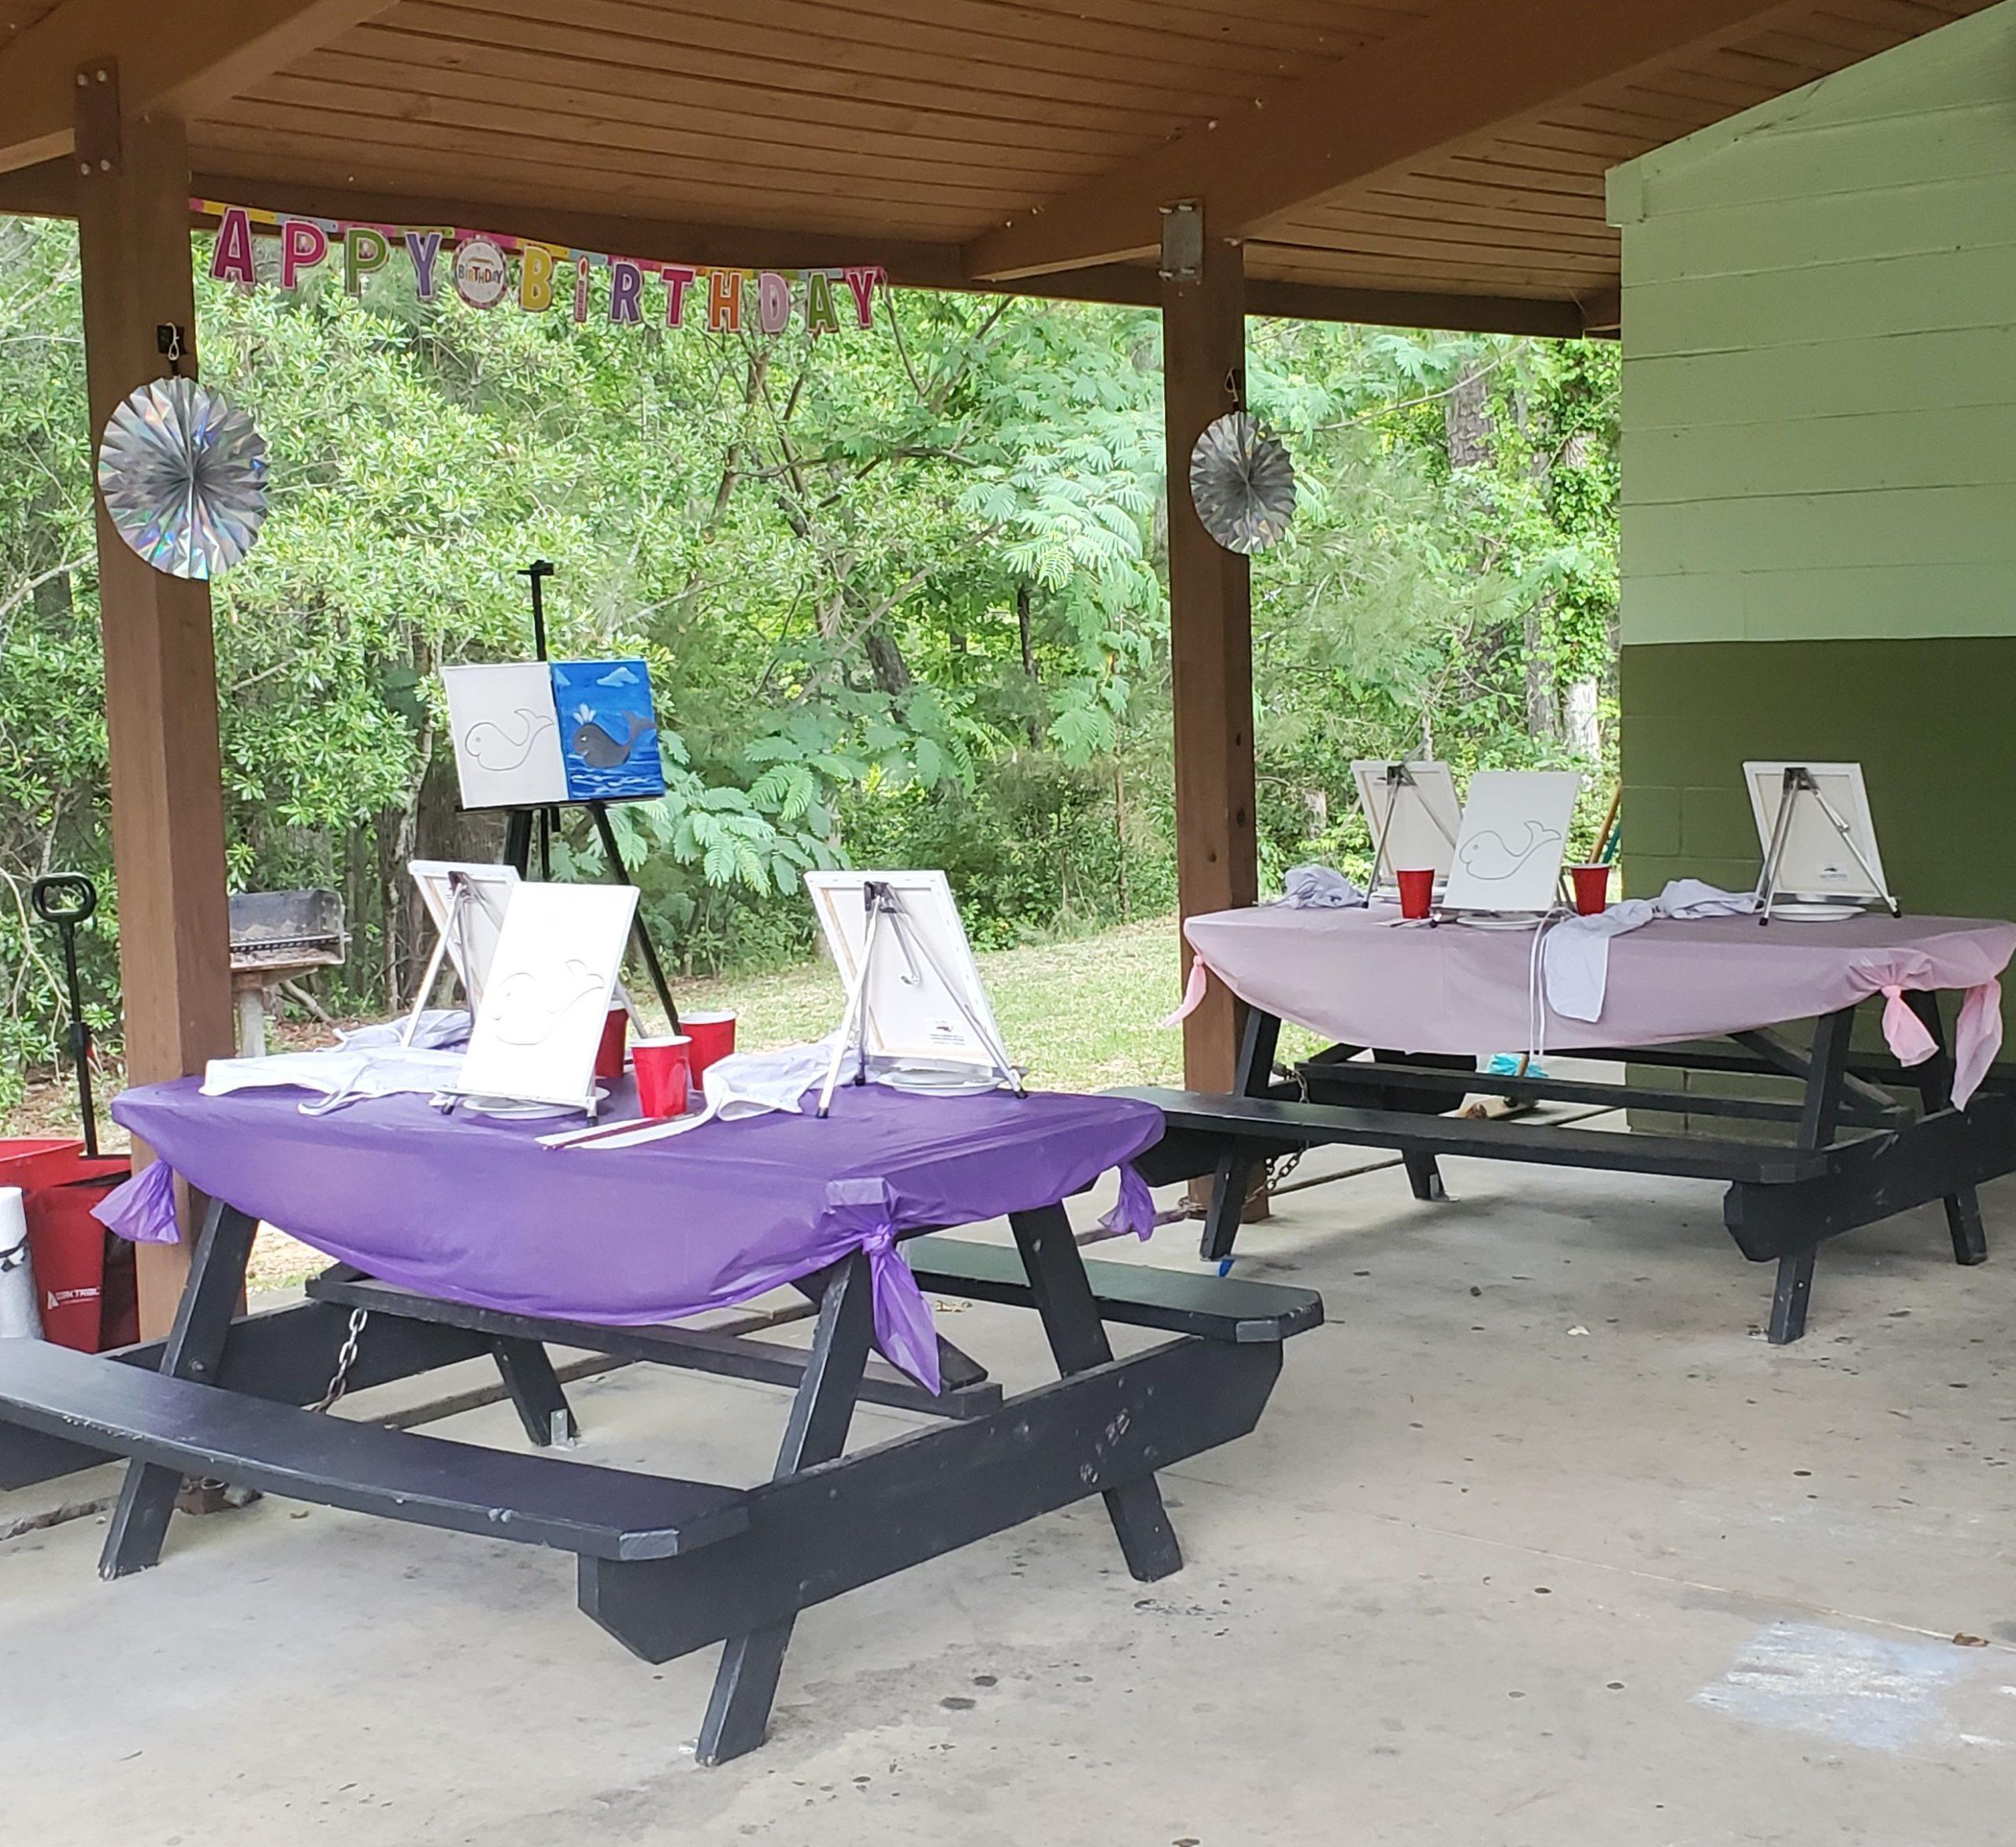 Offsite Kids Birthday Party